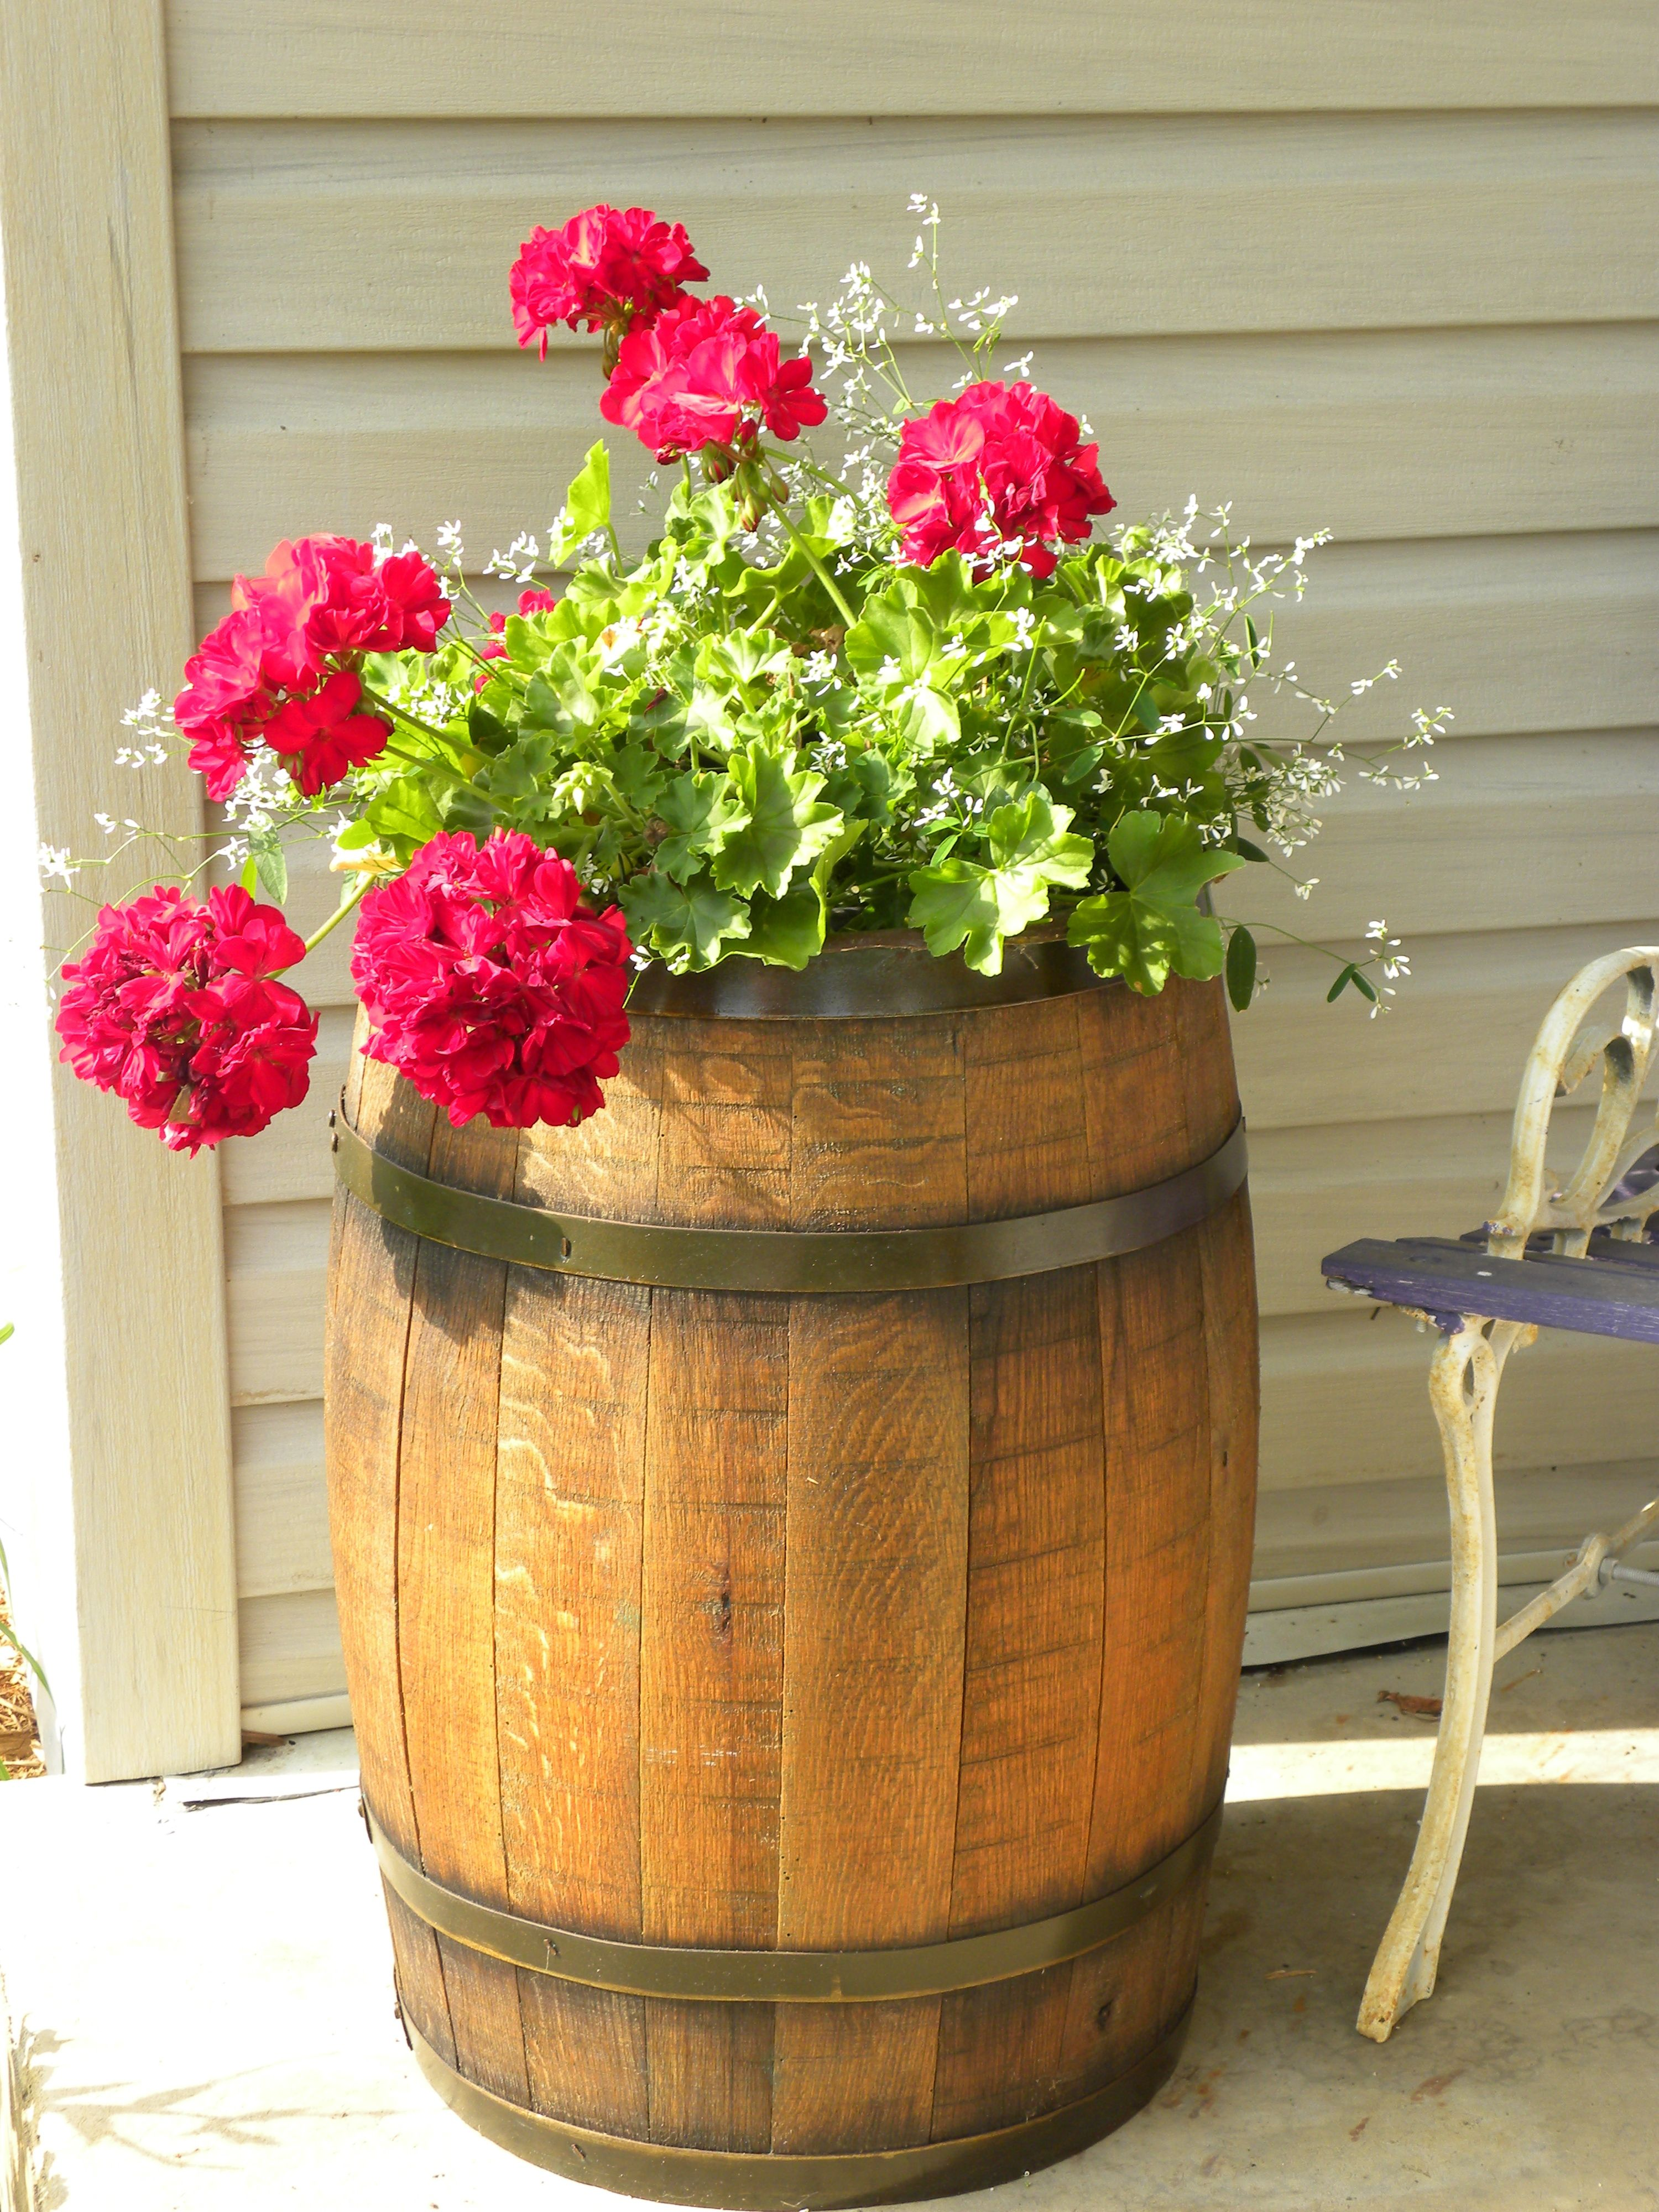 Red geraniums in old wooden barrel flowers pinterest for Wooden barrel planter ideas